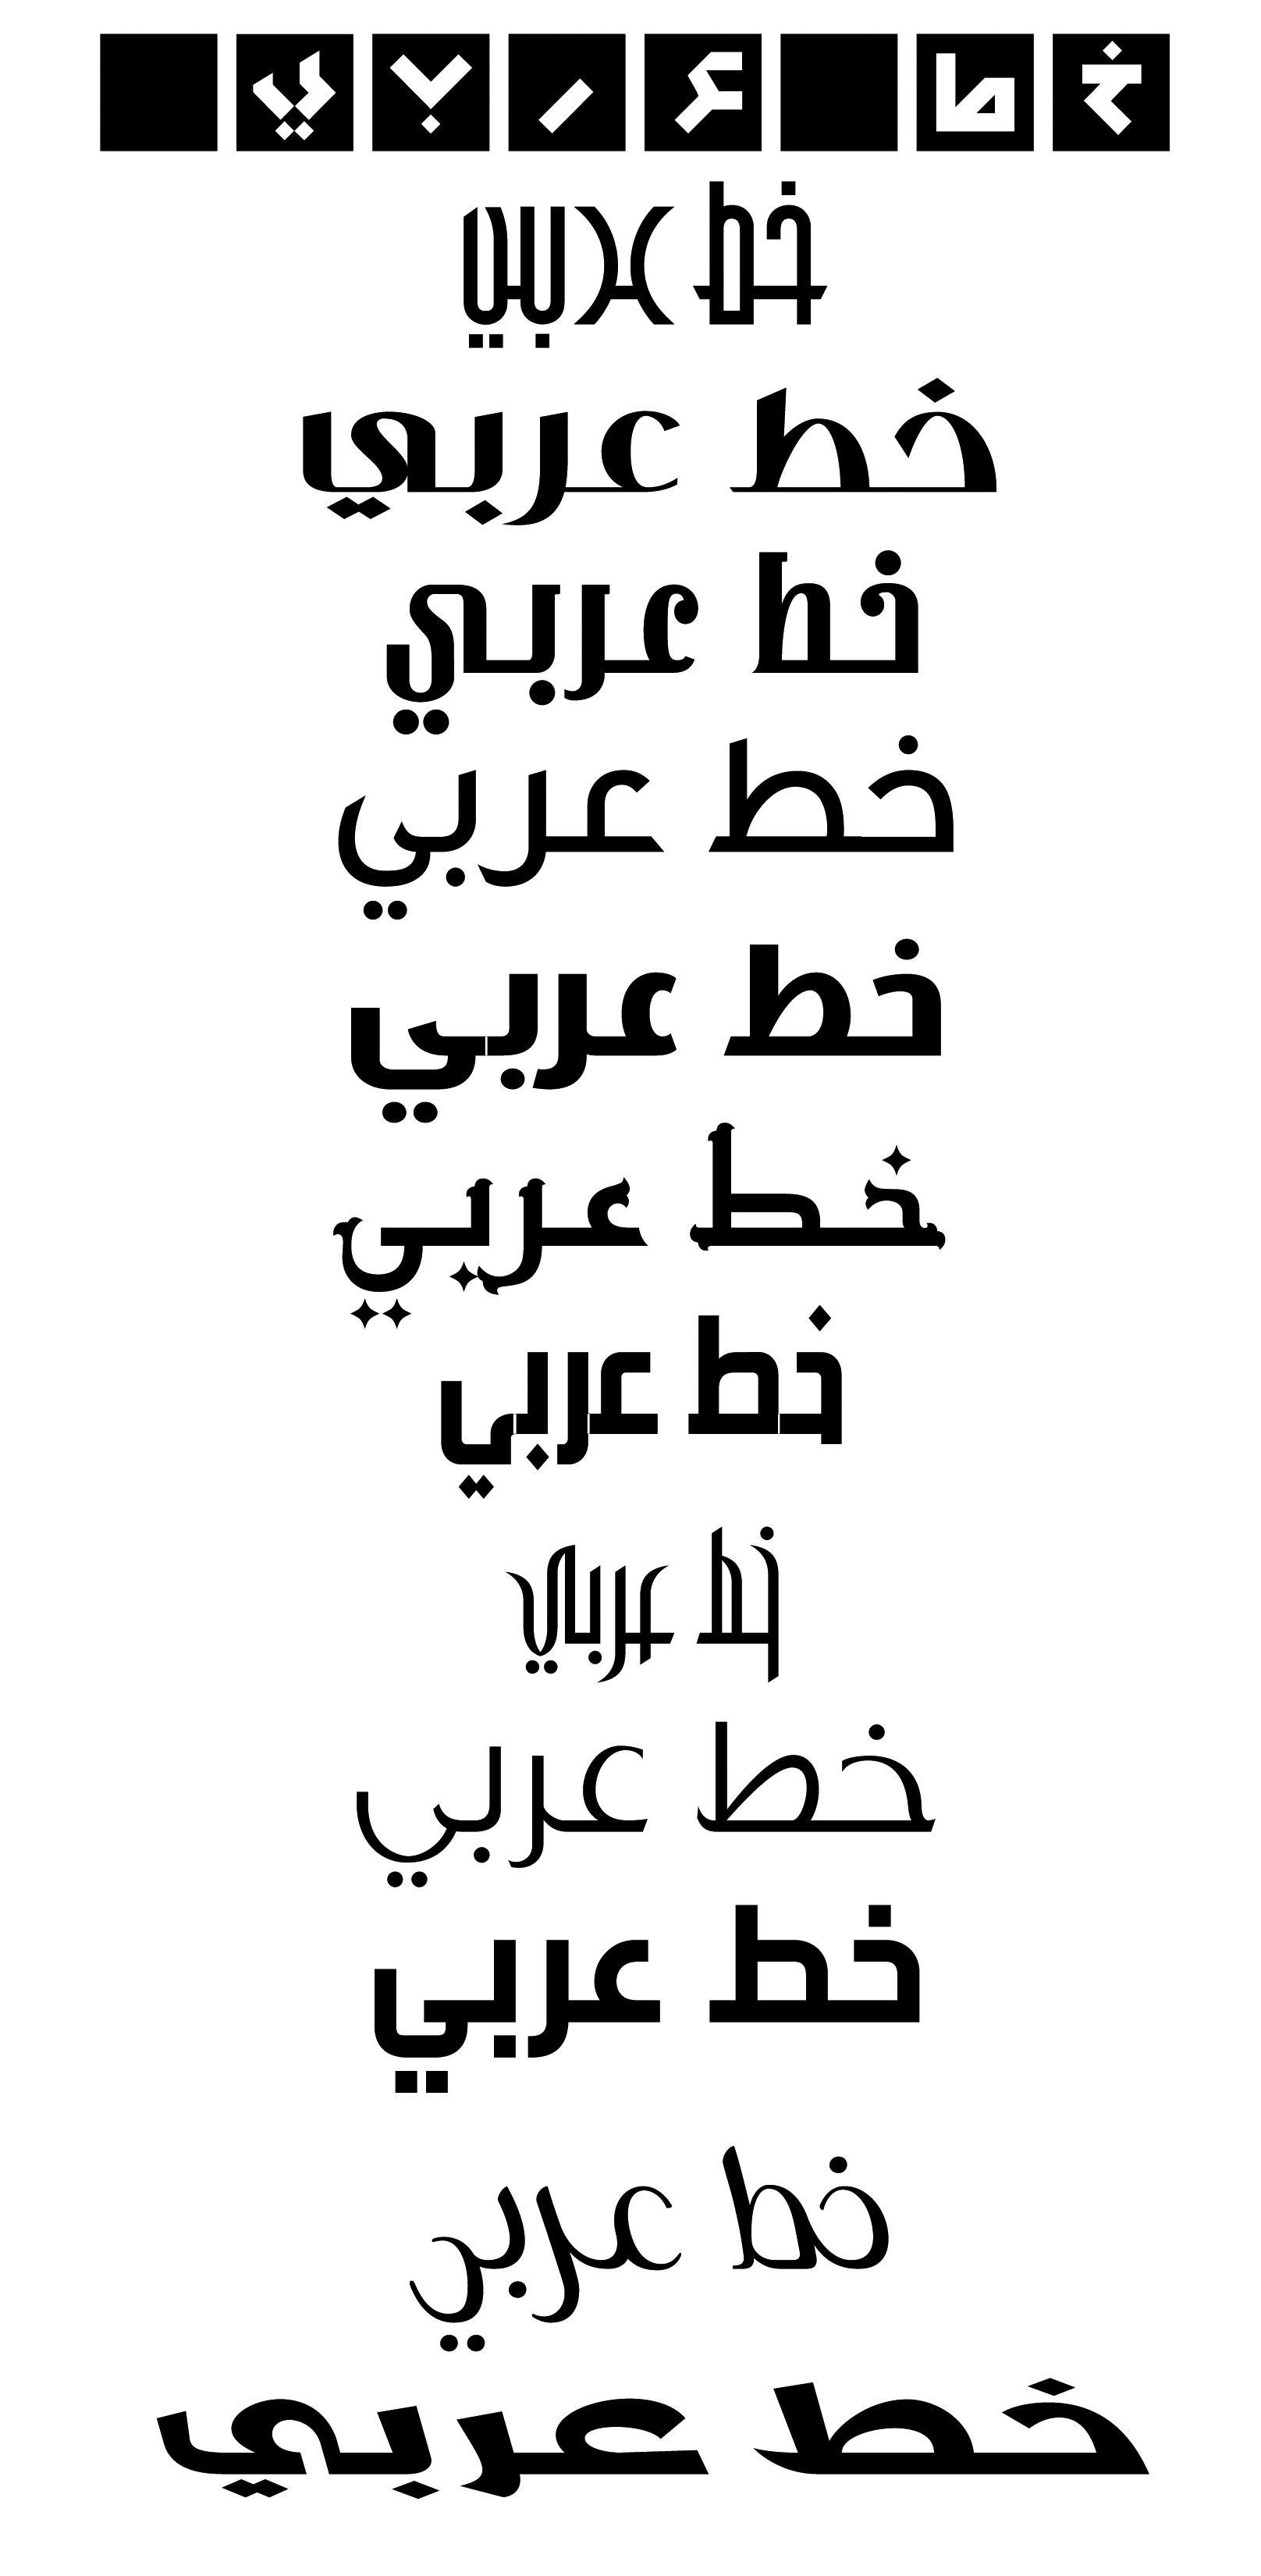 تحميل خطوط عربيه روعه arabic fonts free download